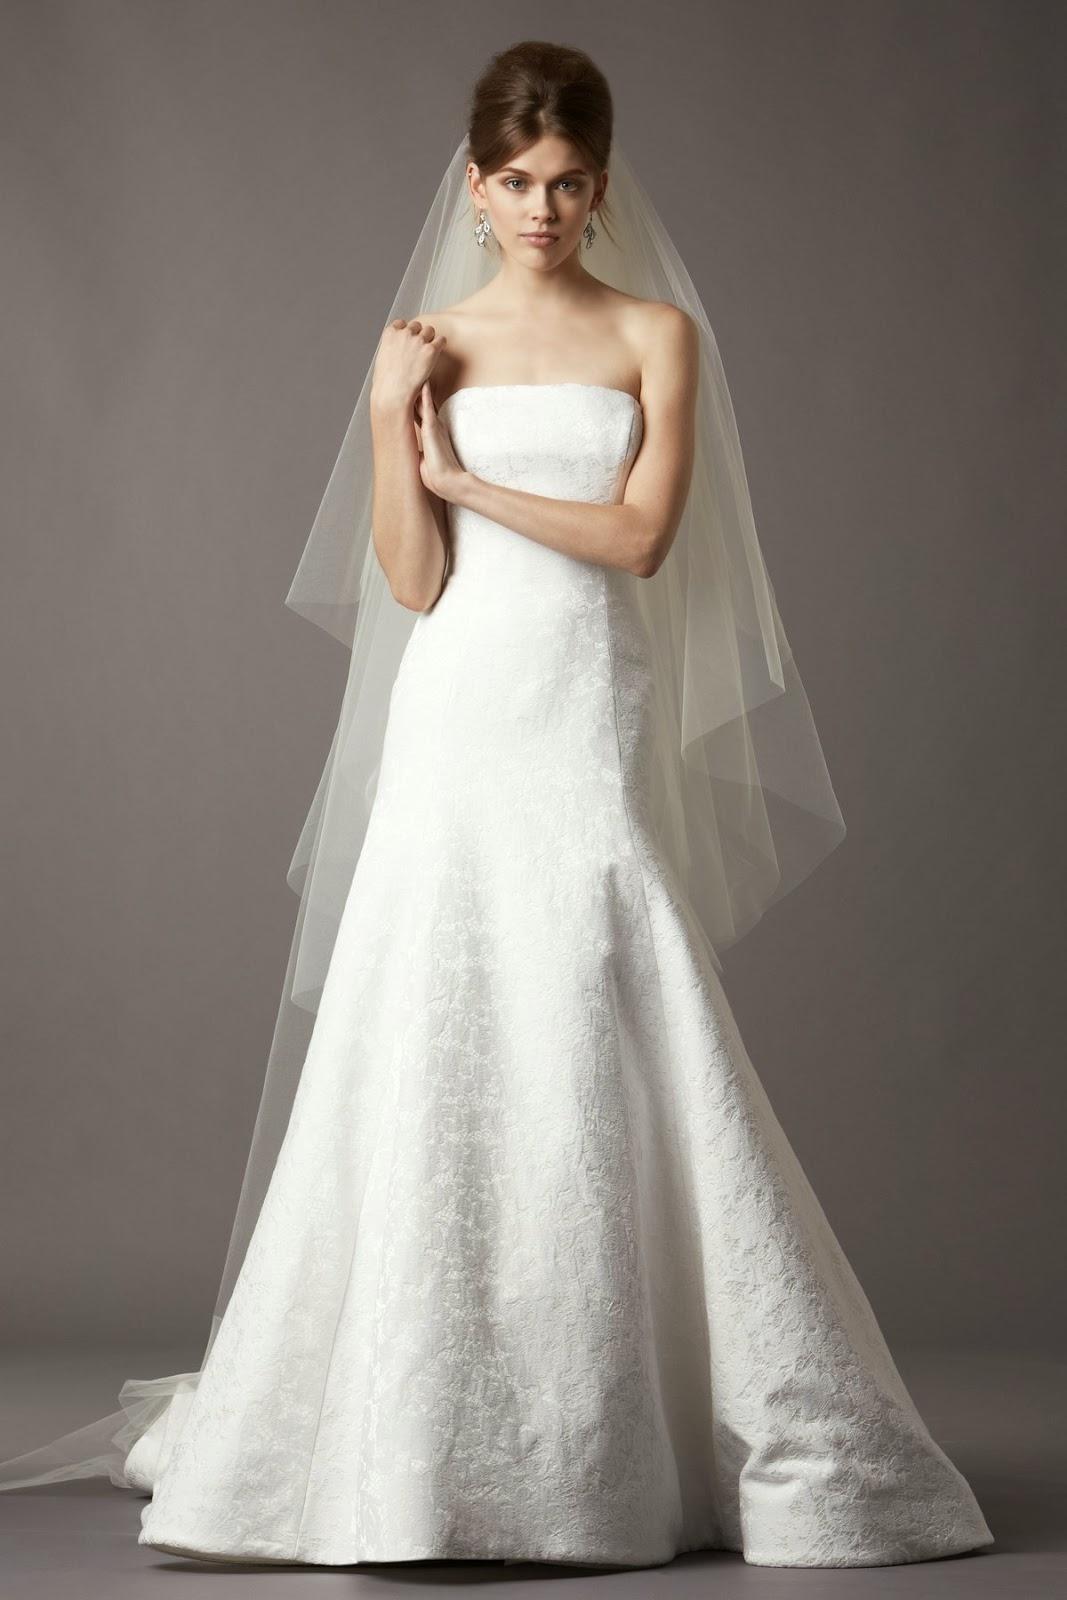 Wedding dress collection 2013 and 2014 amazing luxury wedding dress